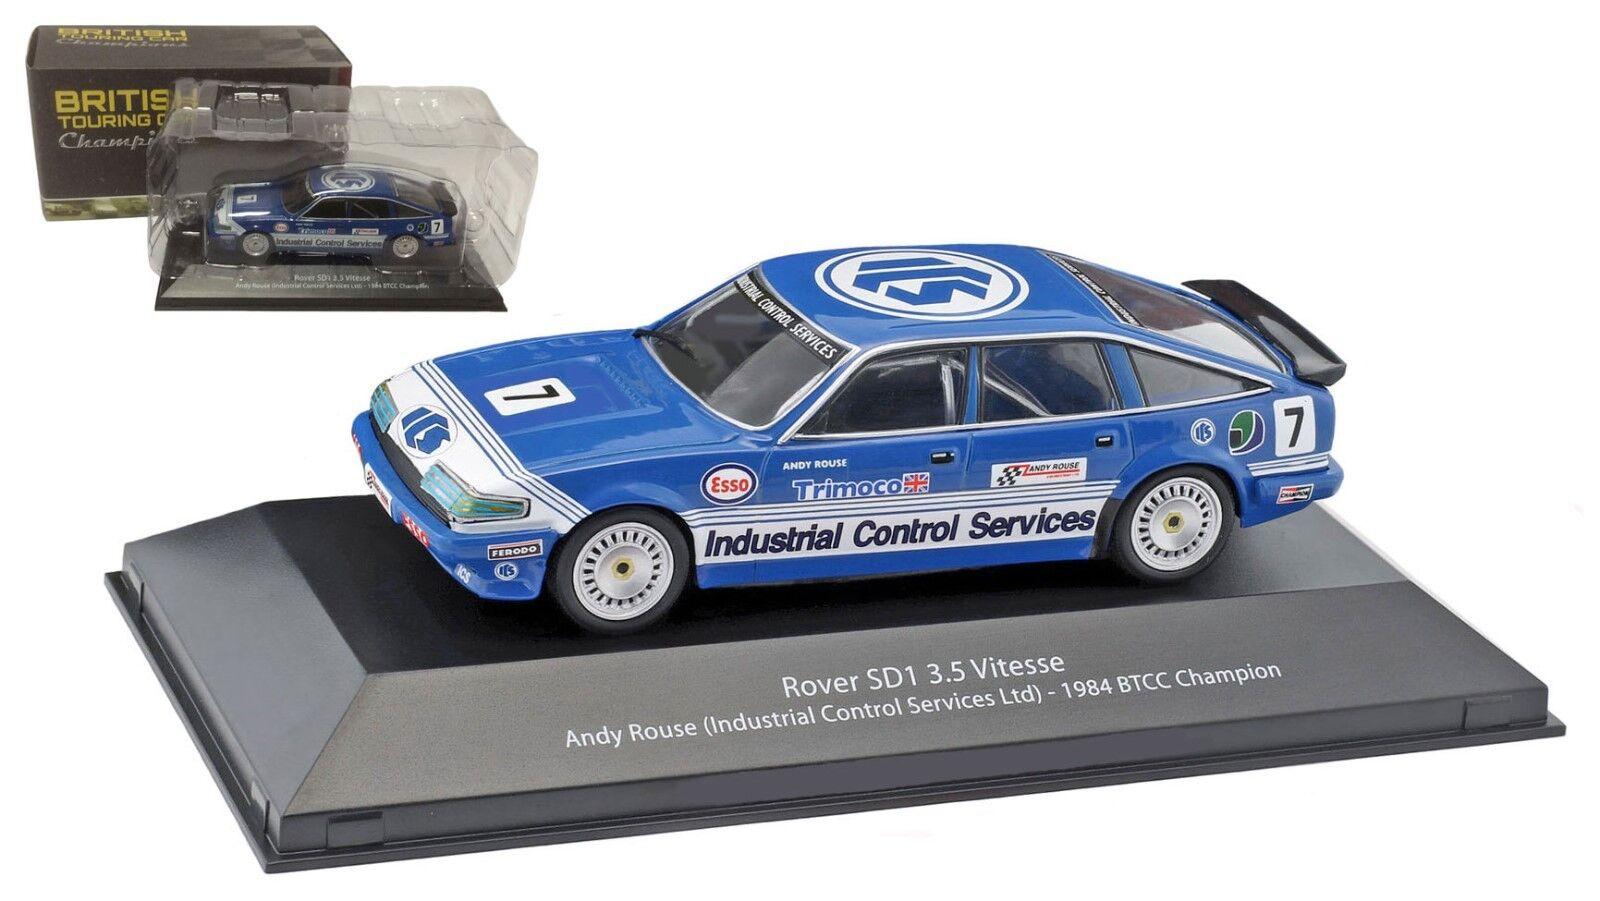 ATLAS ROVER SD1 3.5 VITESSE  ICS Ltd  Racing Champion 1984-Andy Rouse 1/43